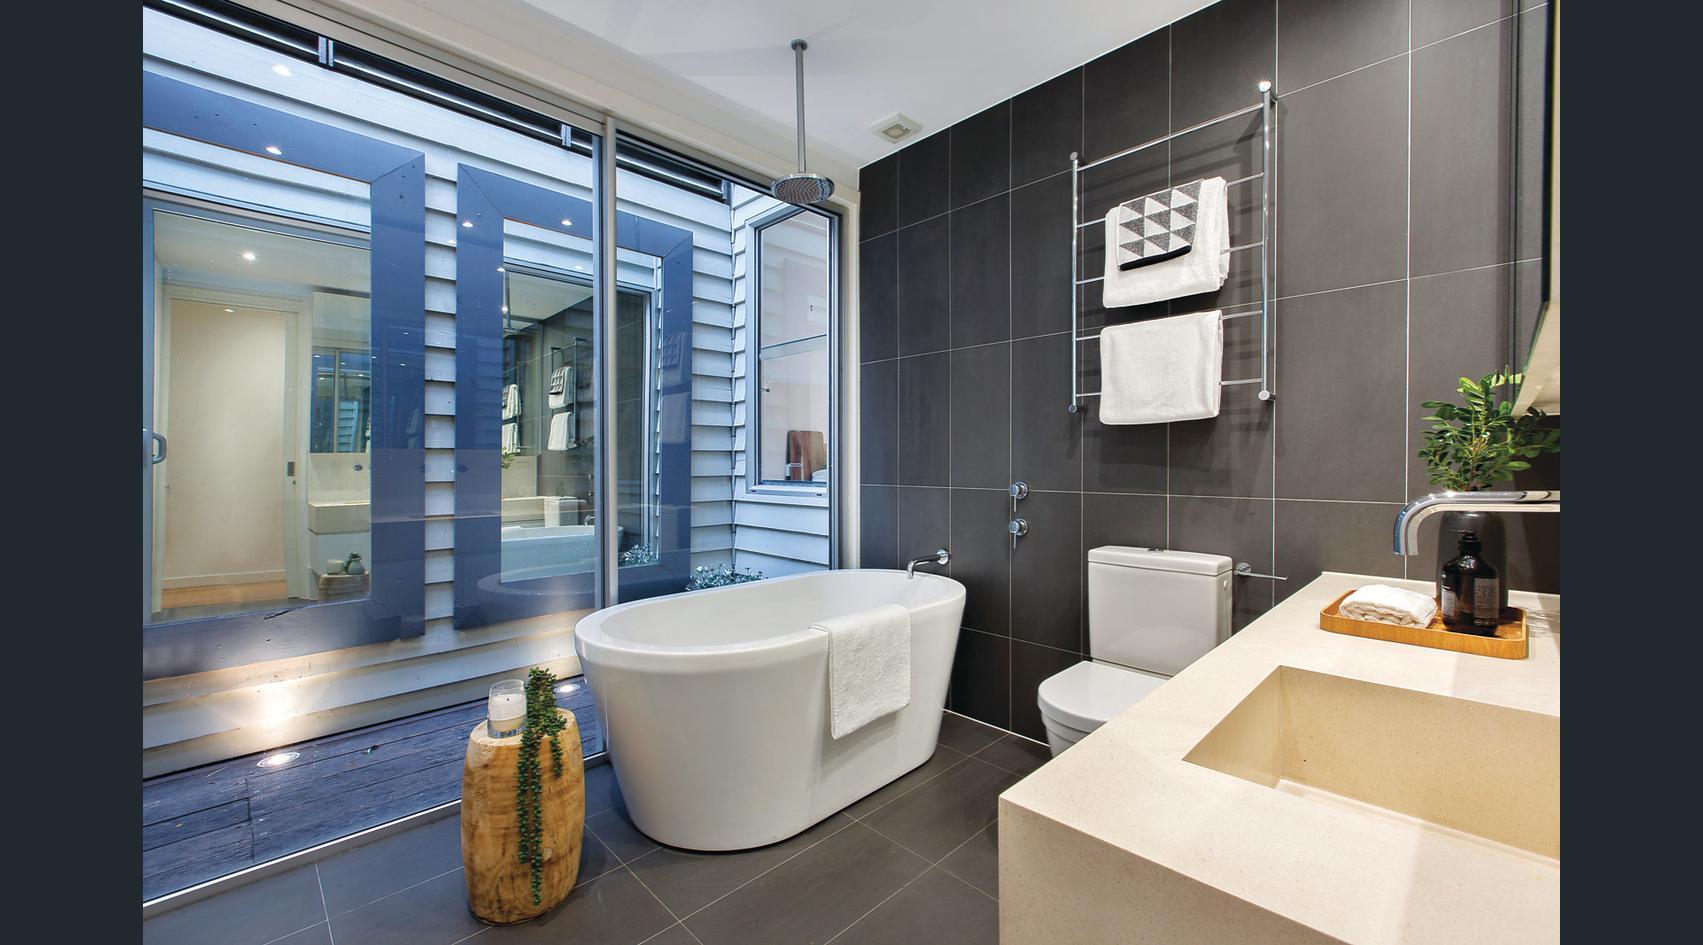 178-farrell-street-port-melbourne-student-accommodation-Melbourne-Bathroom-Unilodgers